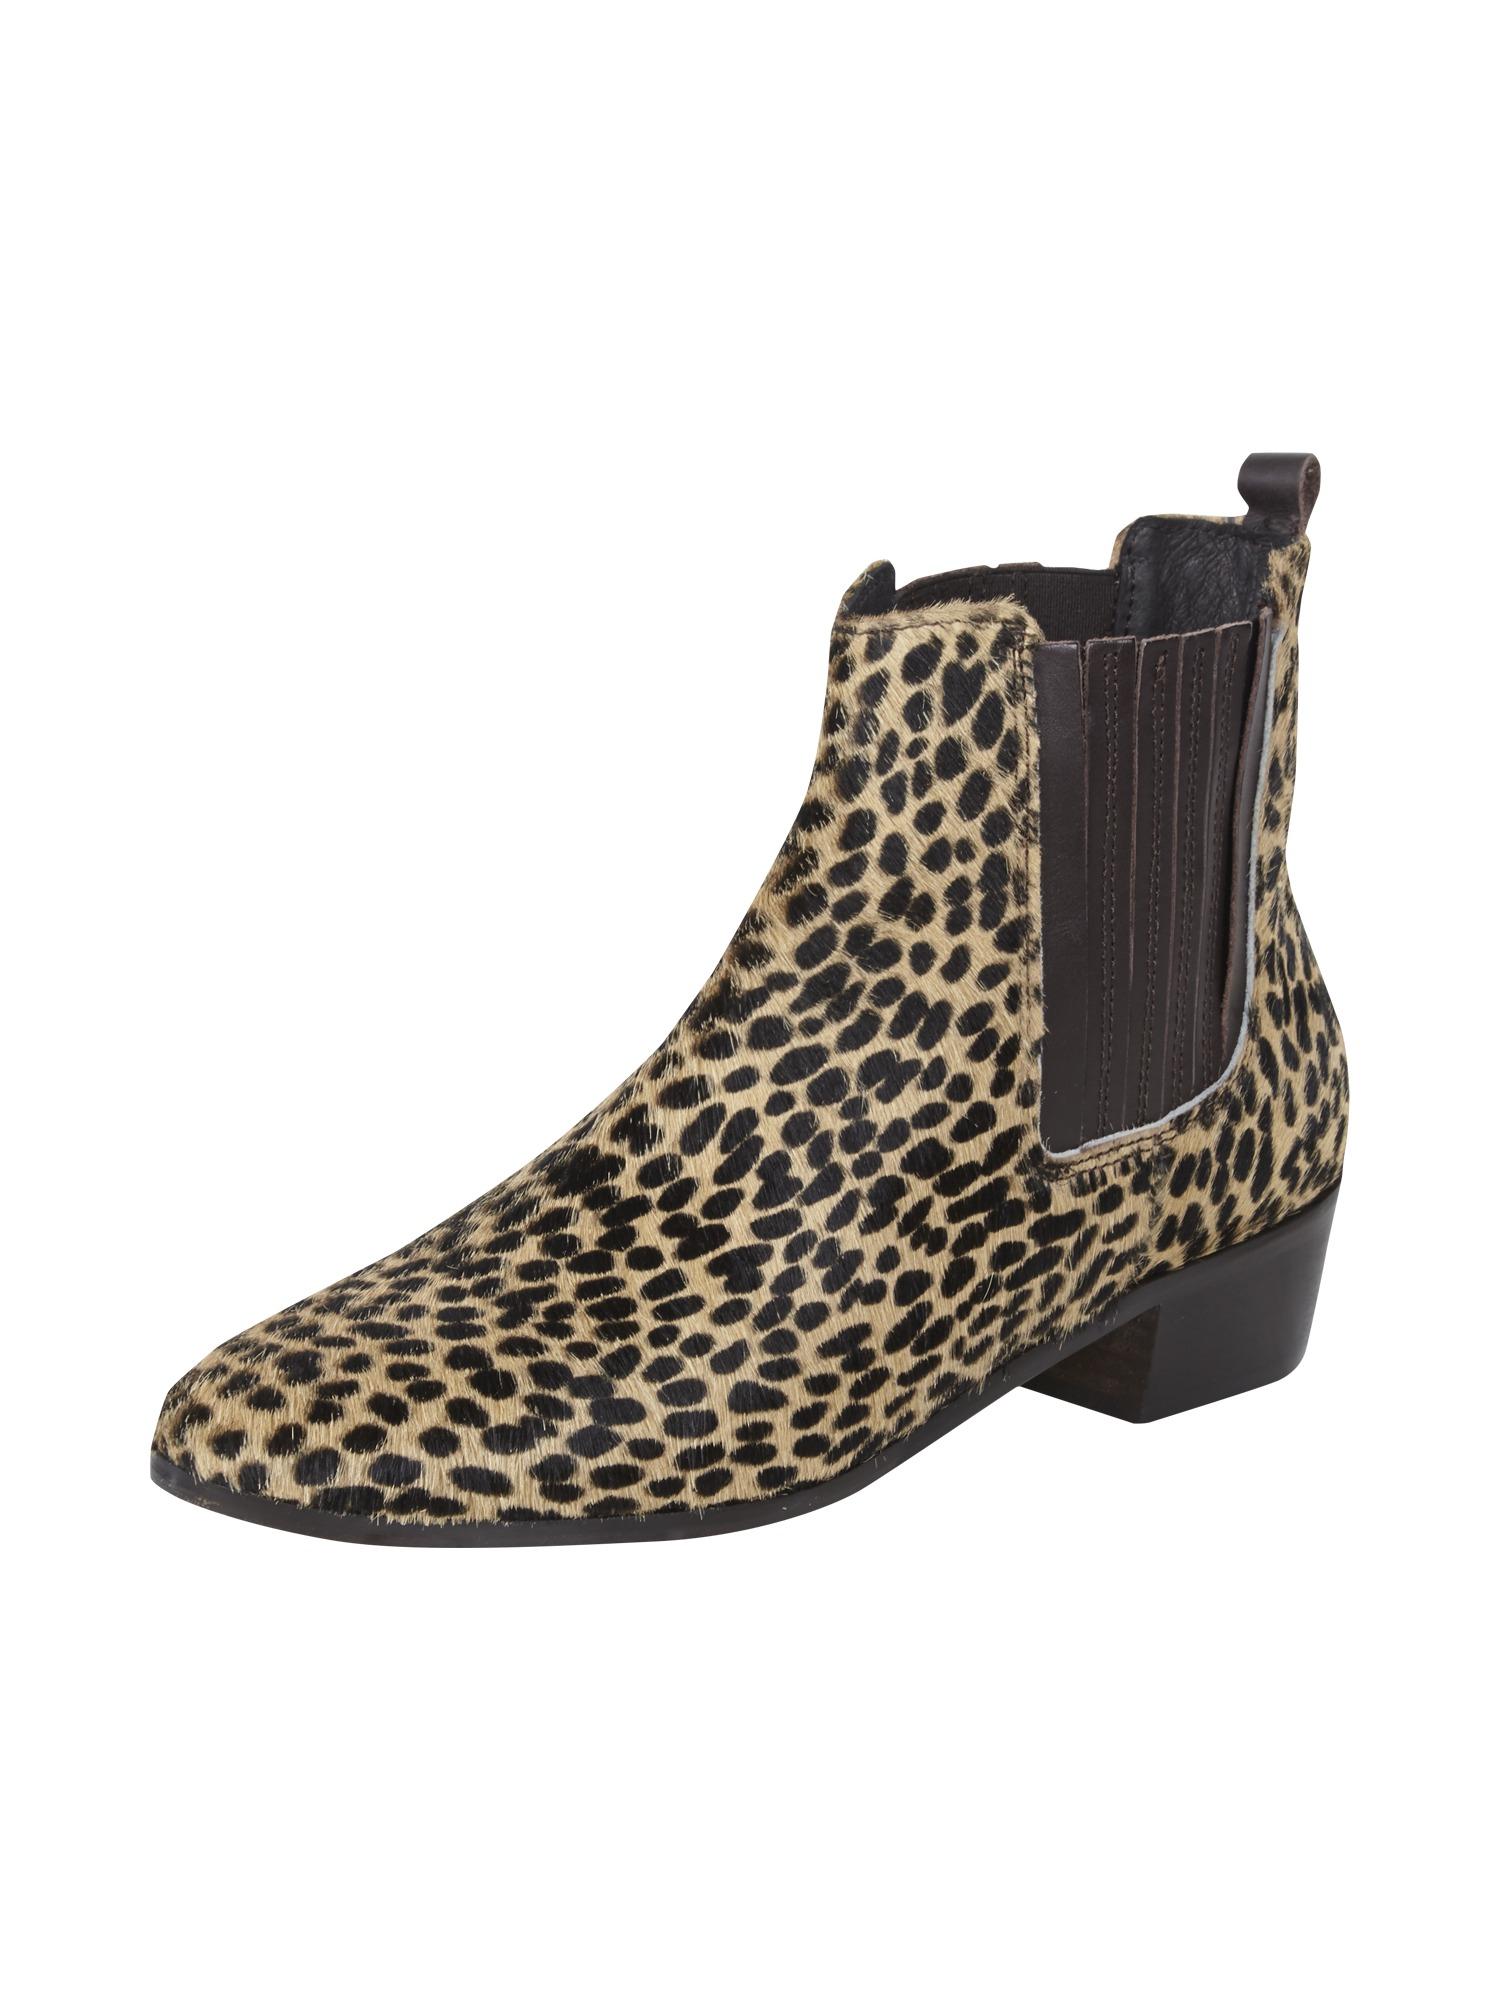 max-mara-weekend-chelsea-boots-im-leoparden-look-camel_9101512,59113f,1500xf